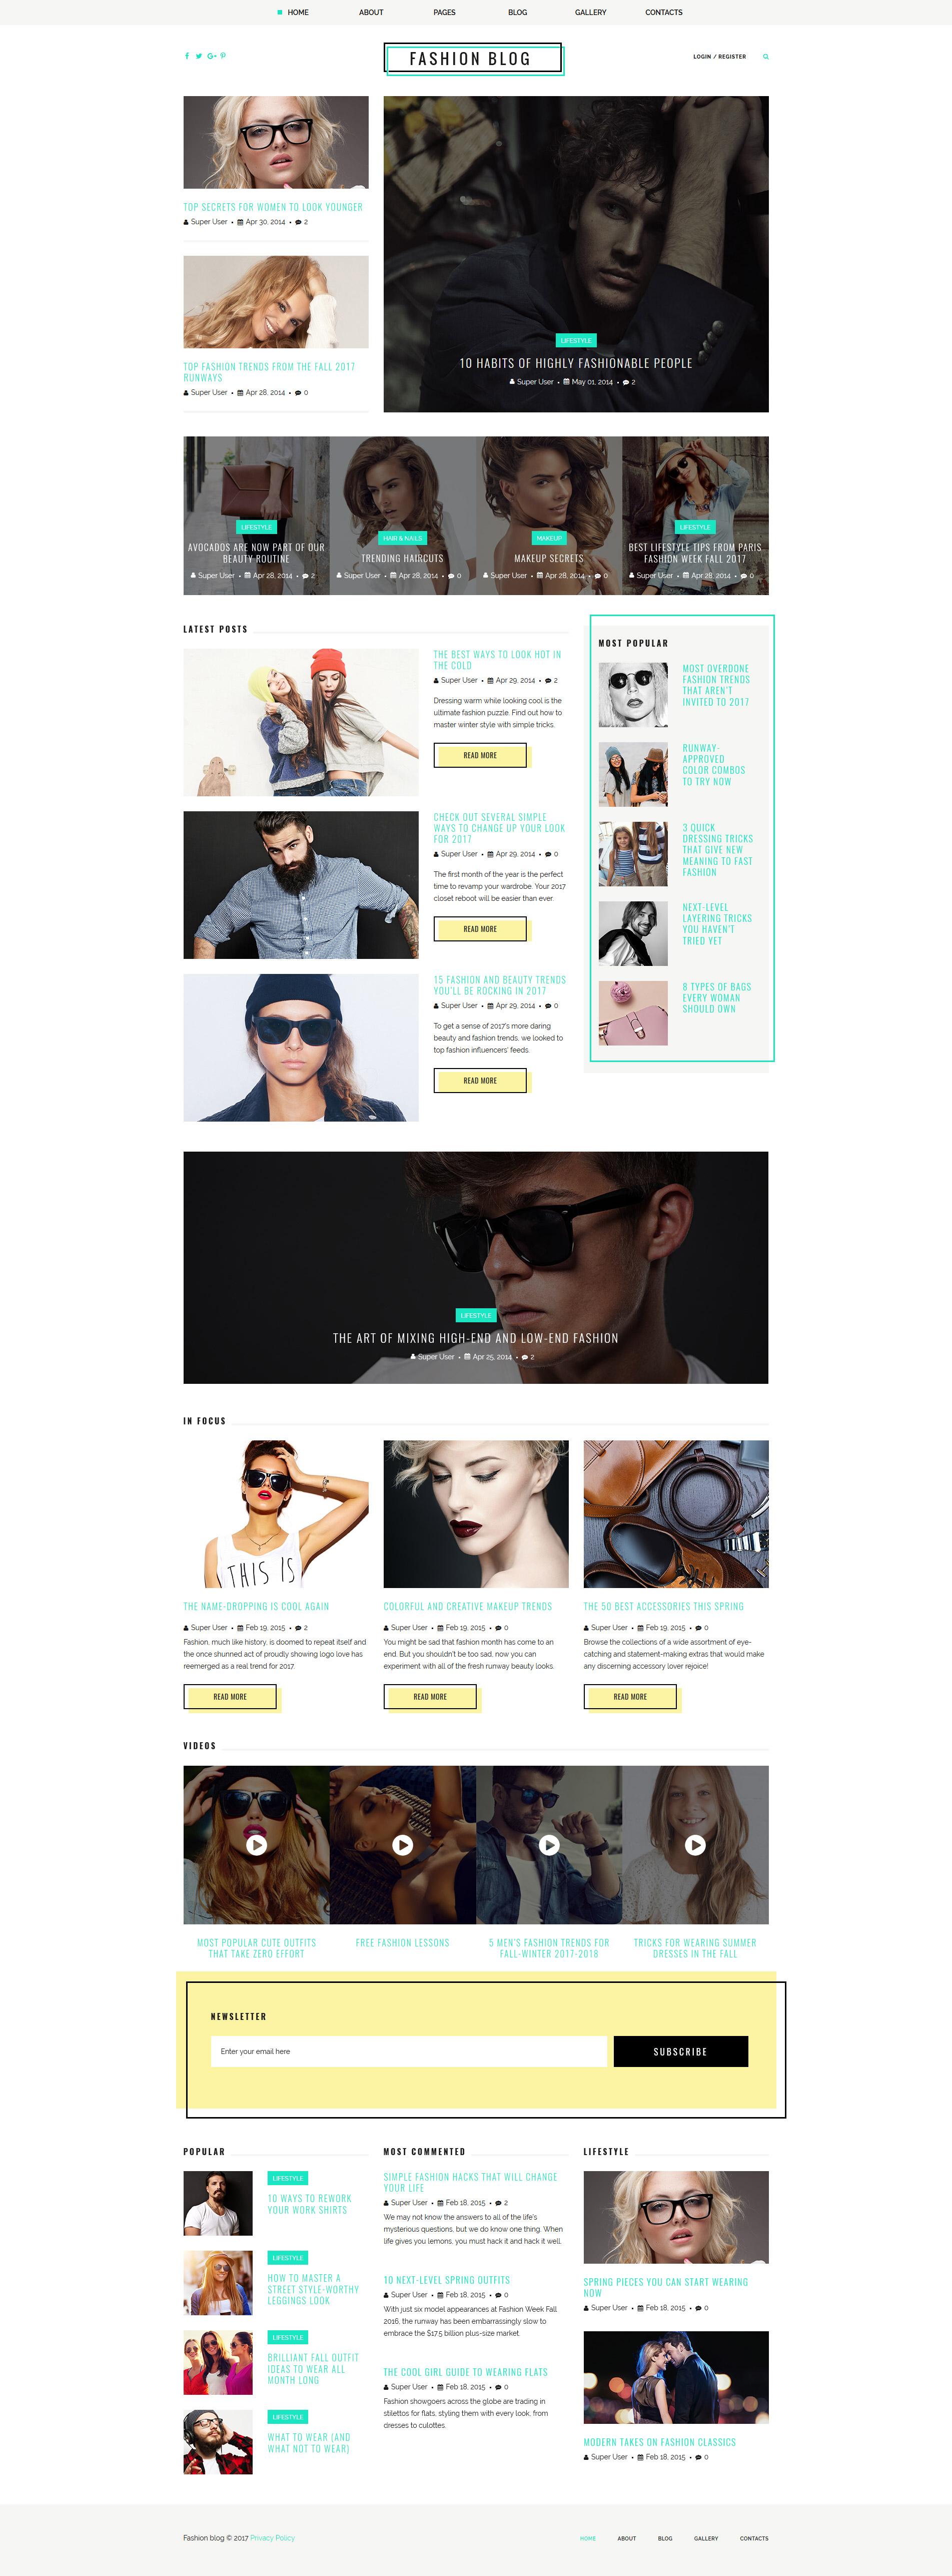 Адаптивный Joomla шаблон №63409 на тему блог о моде